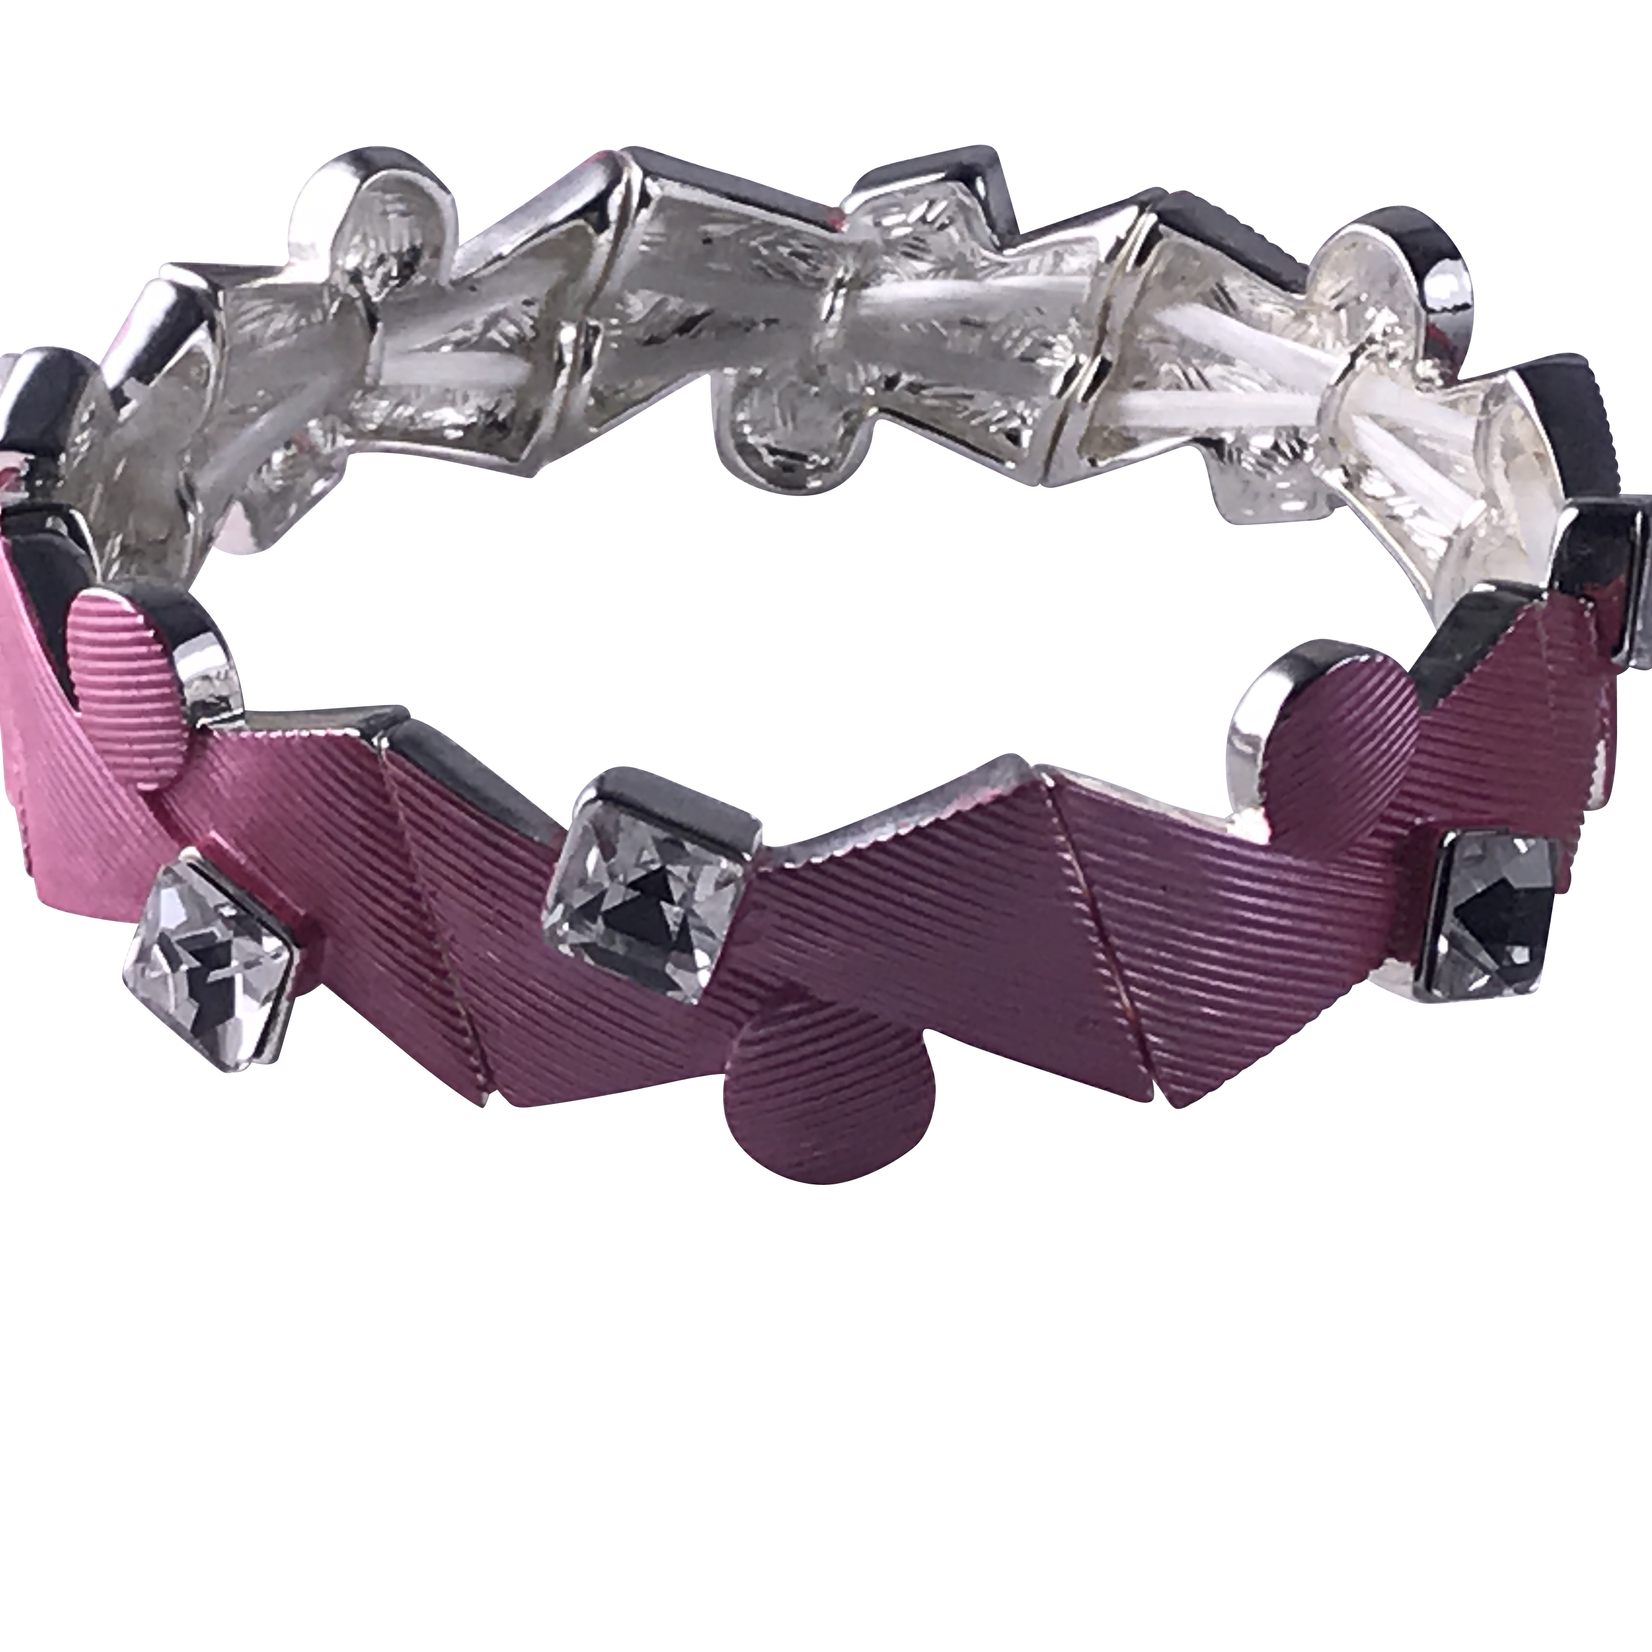 Biba armband zilverkleurig - roze driehoekjes